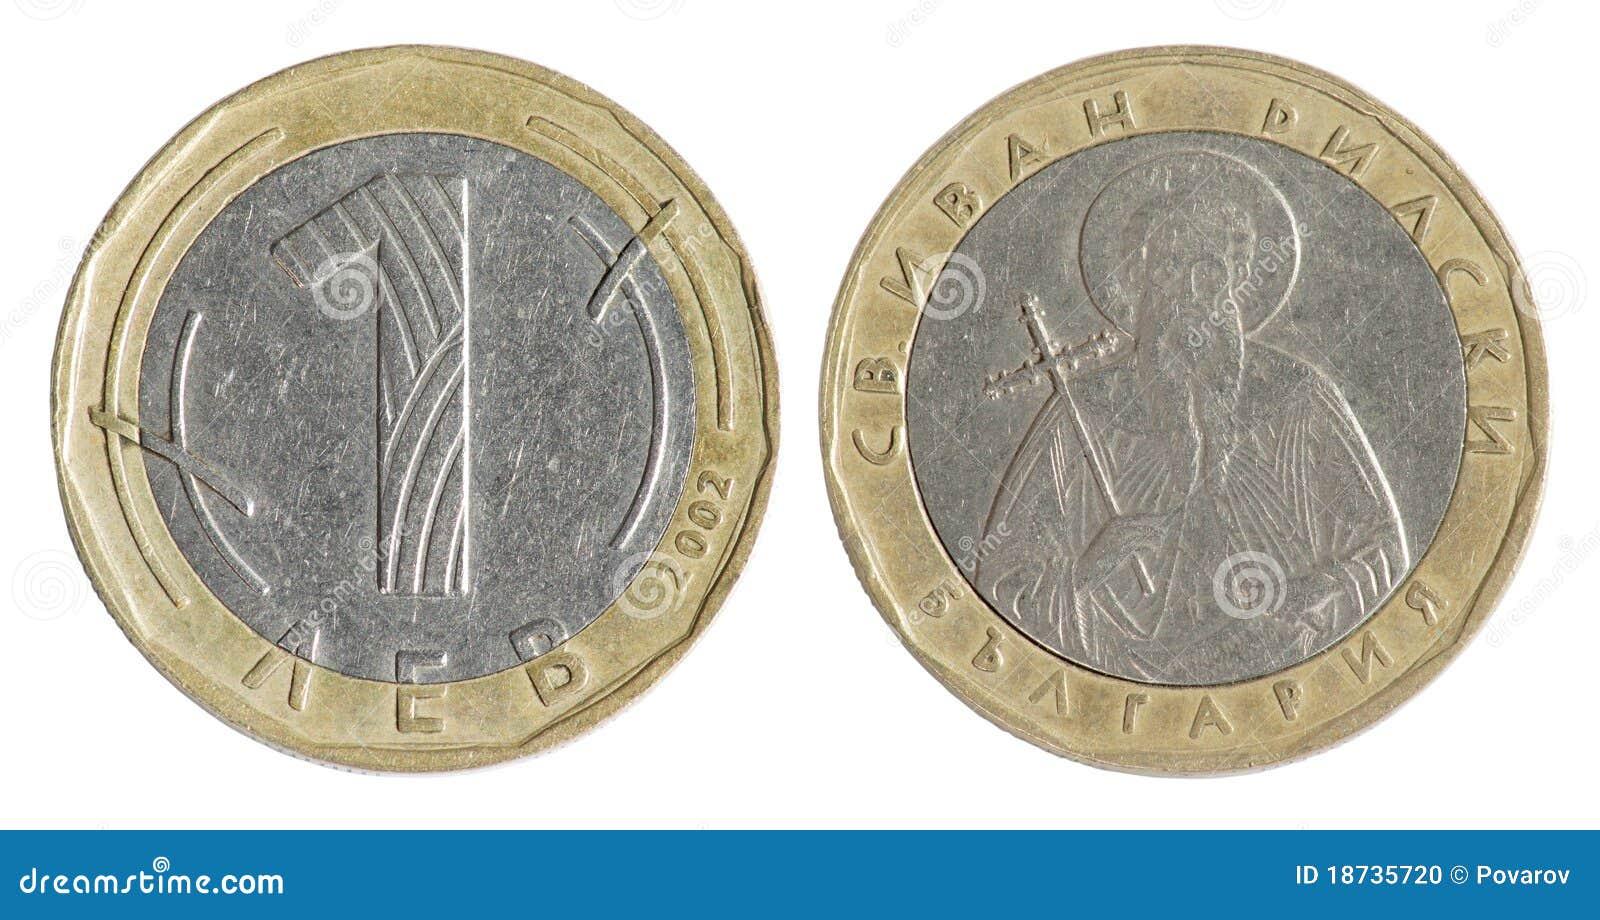 1 lev 2002 coin price in india / Caviar token address quiz